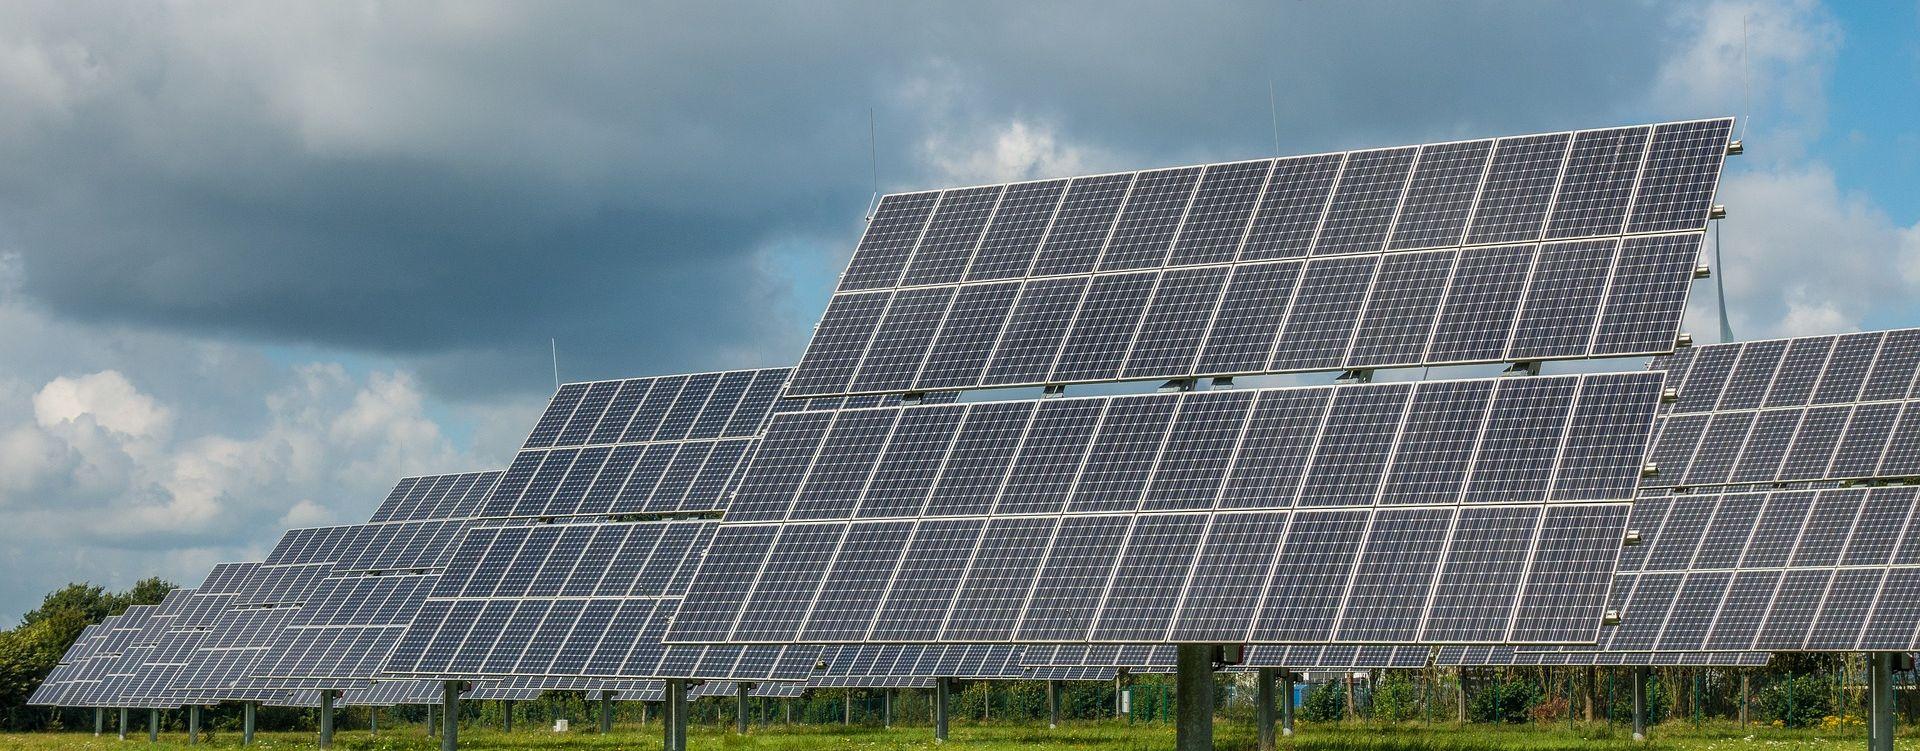 AleaSoft - Photovoltaic solar panels Portugal